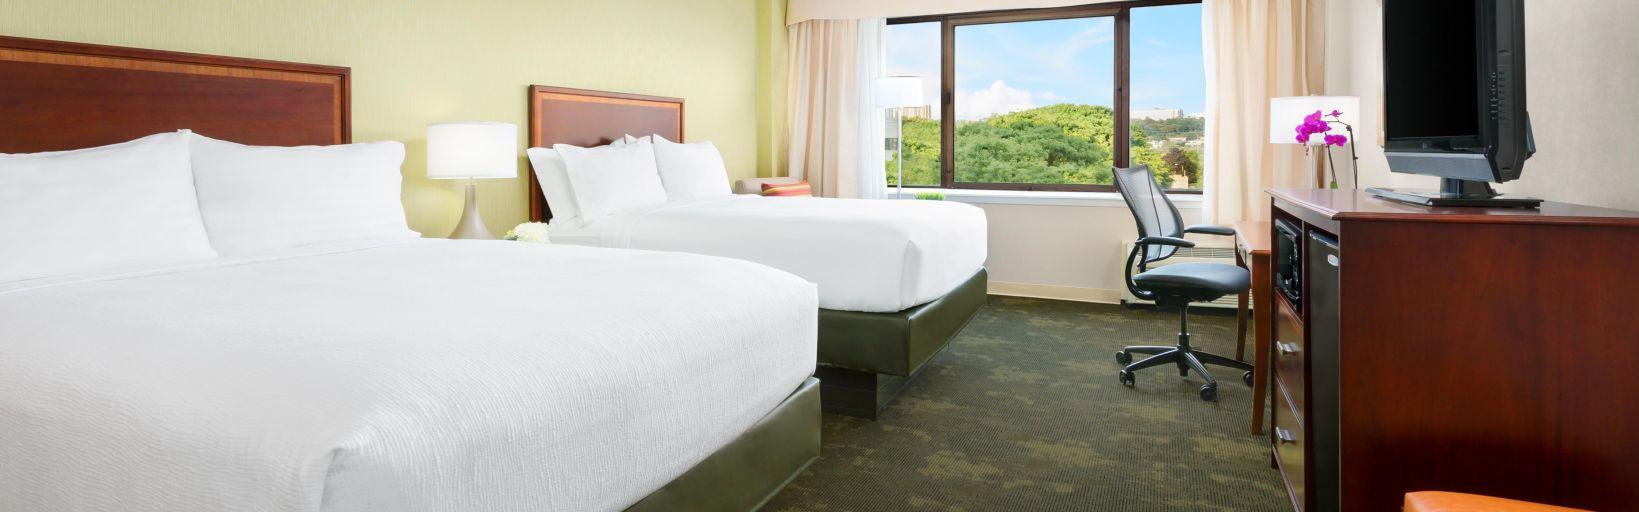 Holiday Inn Secaucus Meadowlands Hotel by IHG